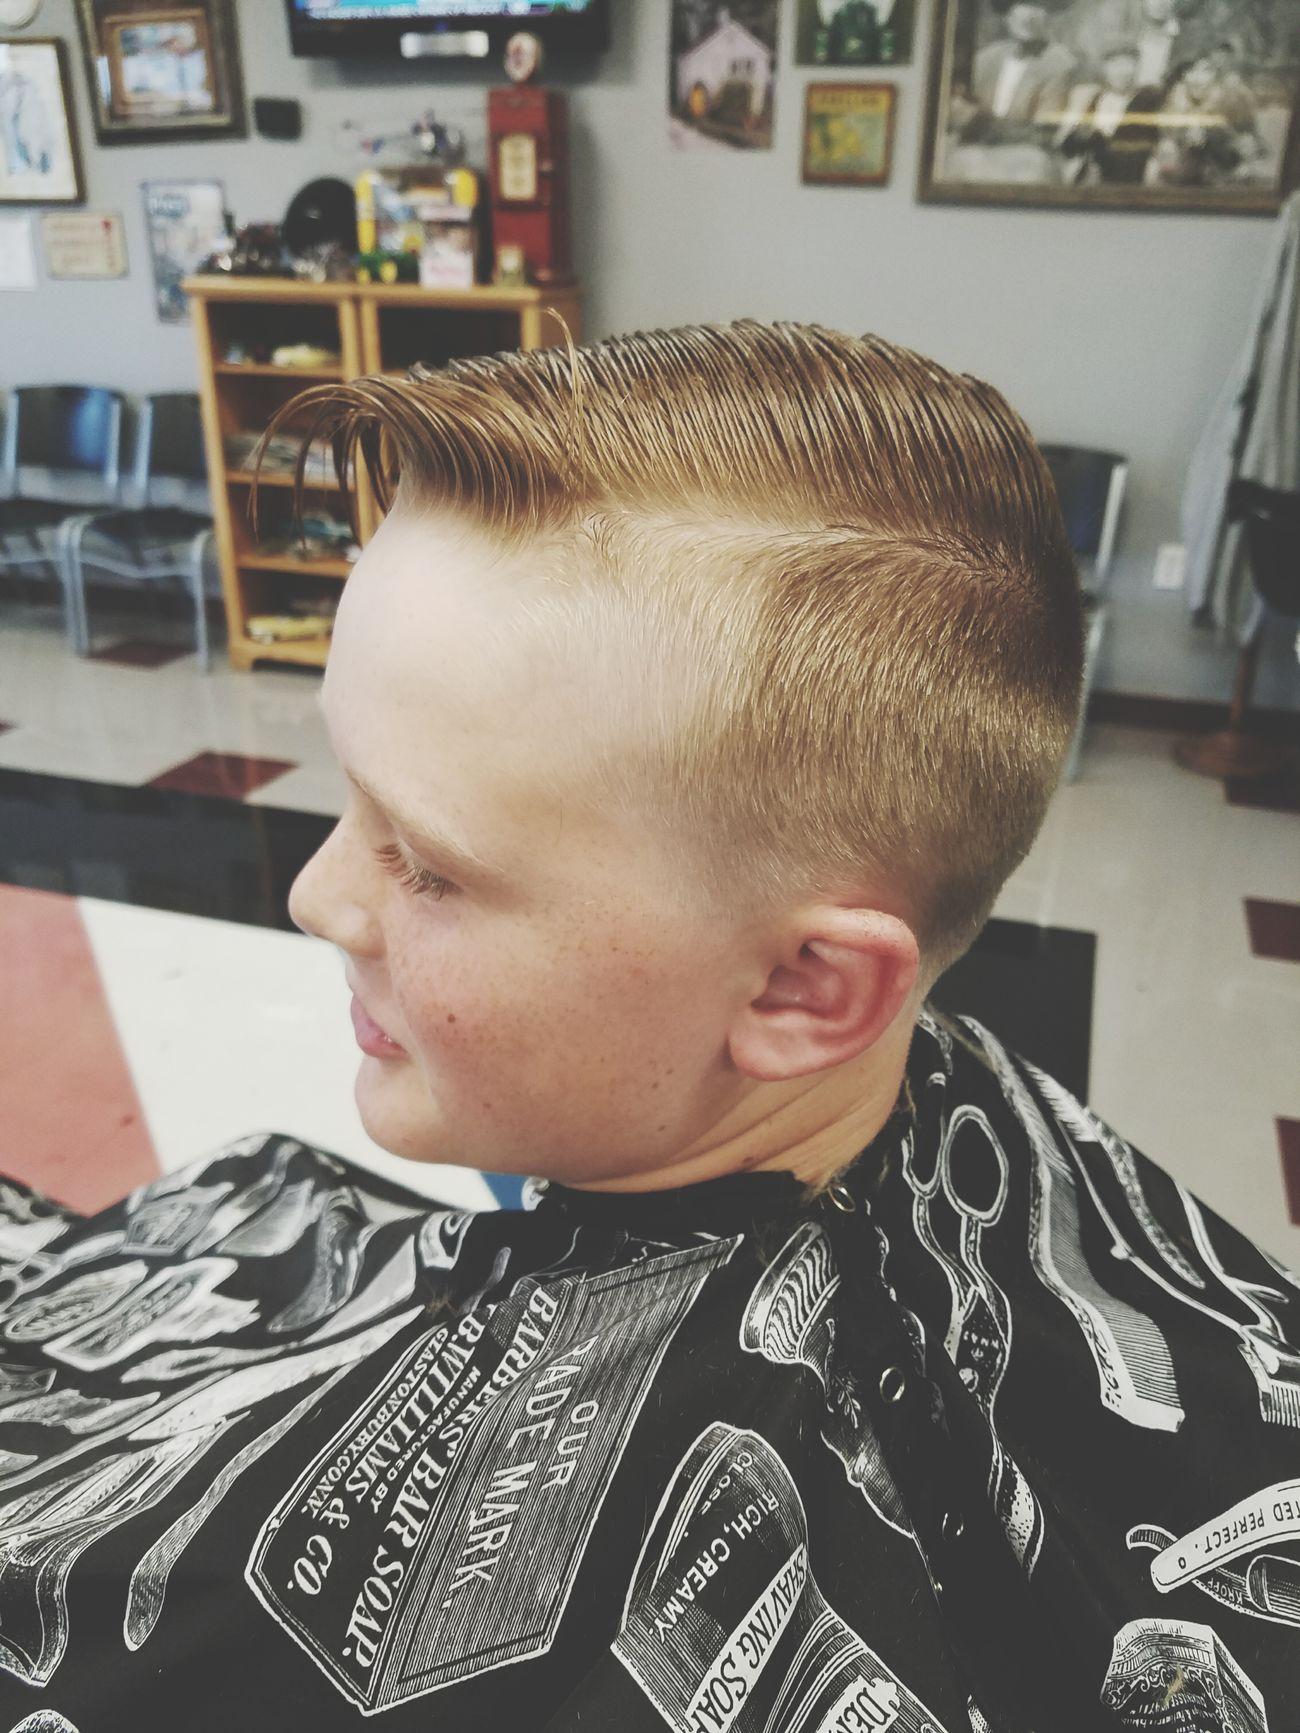 One Person People Child Headshot Close-up Haircut Time Stylish Real People Portrait Minimalism